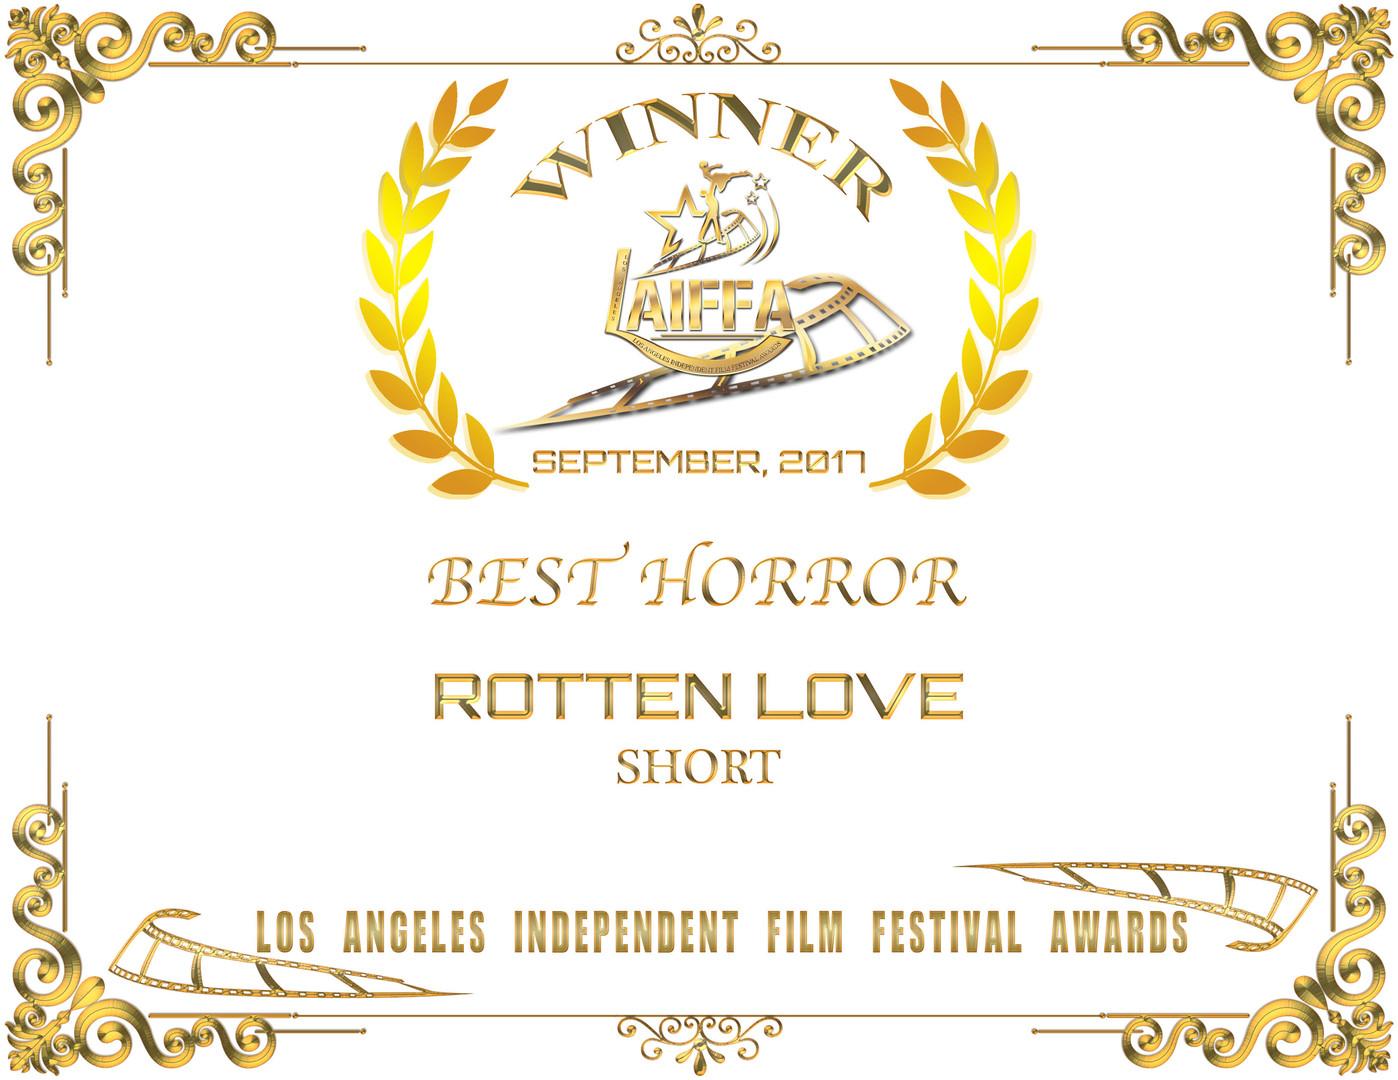 Los Angeles Independent Film Festival Awards